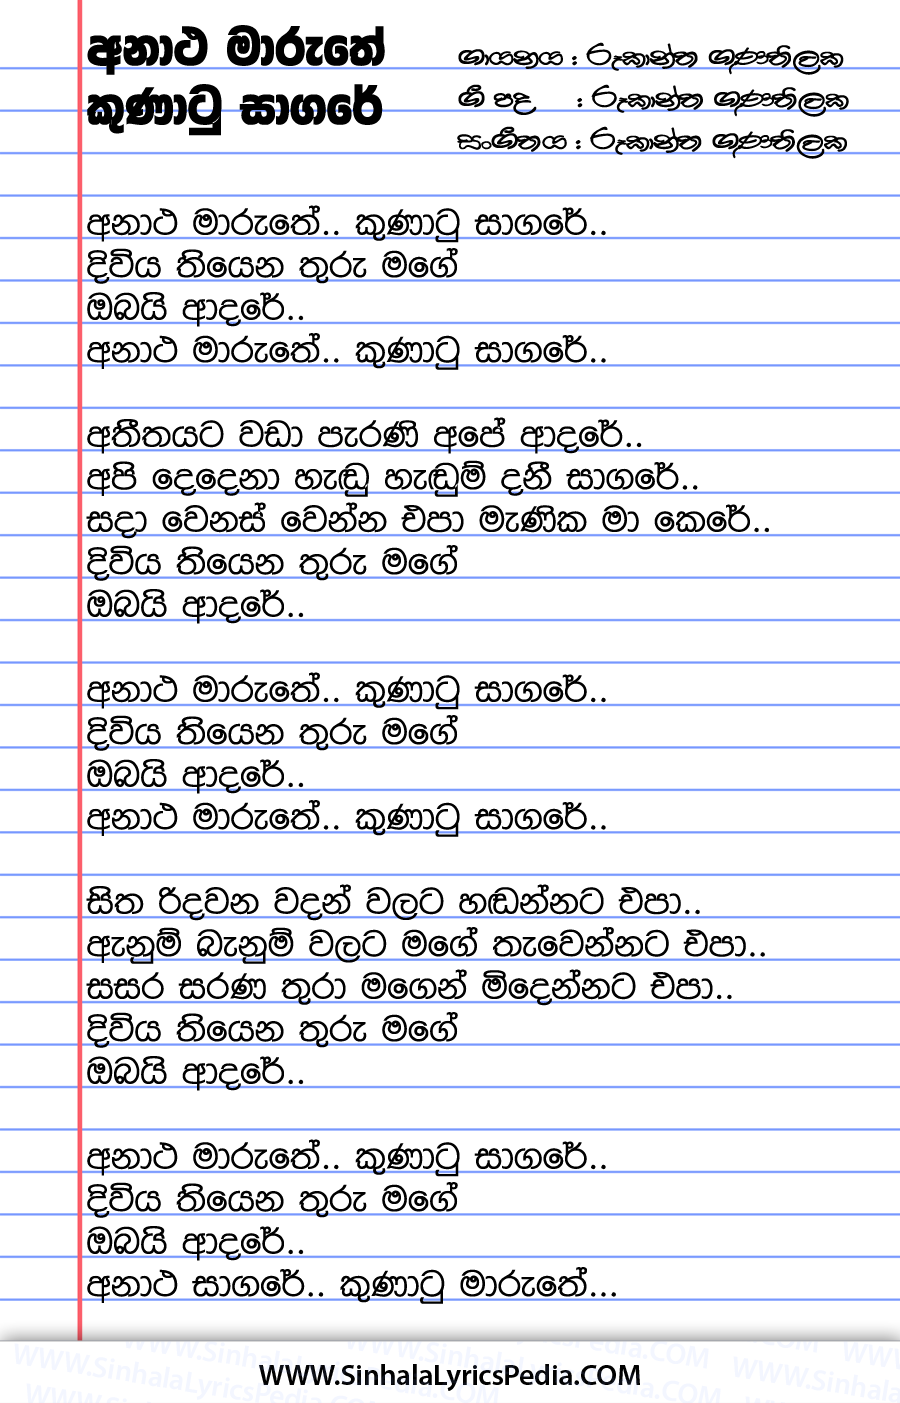 Anatha Maruthe Kunatu Sagare Song Lyrics